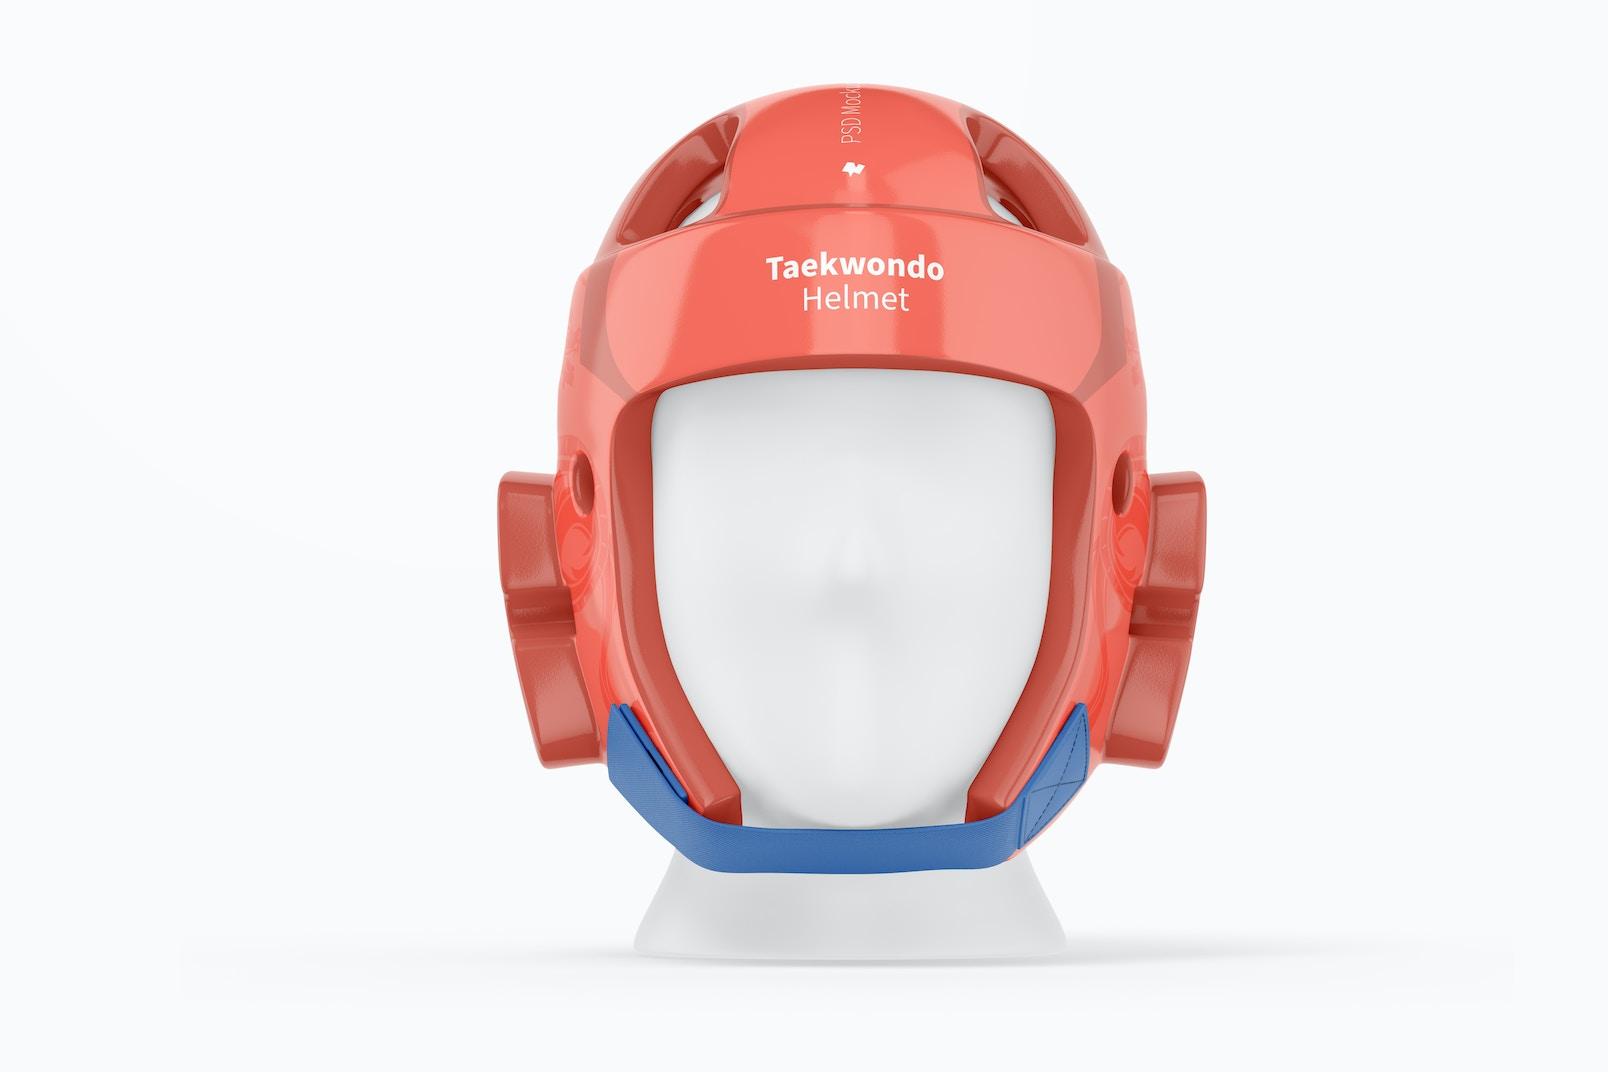 Taekwondo Helmet Mockup, Front View